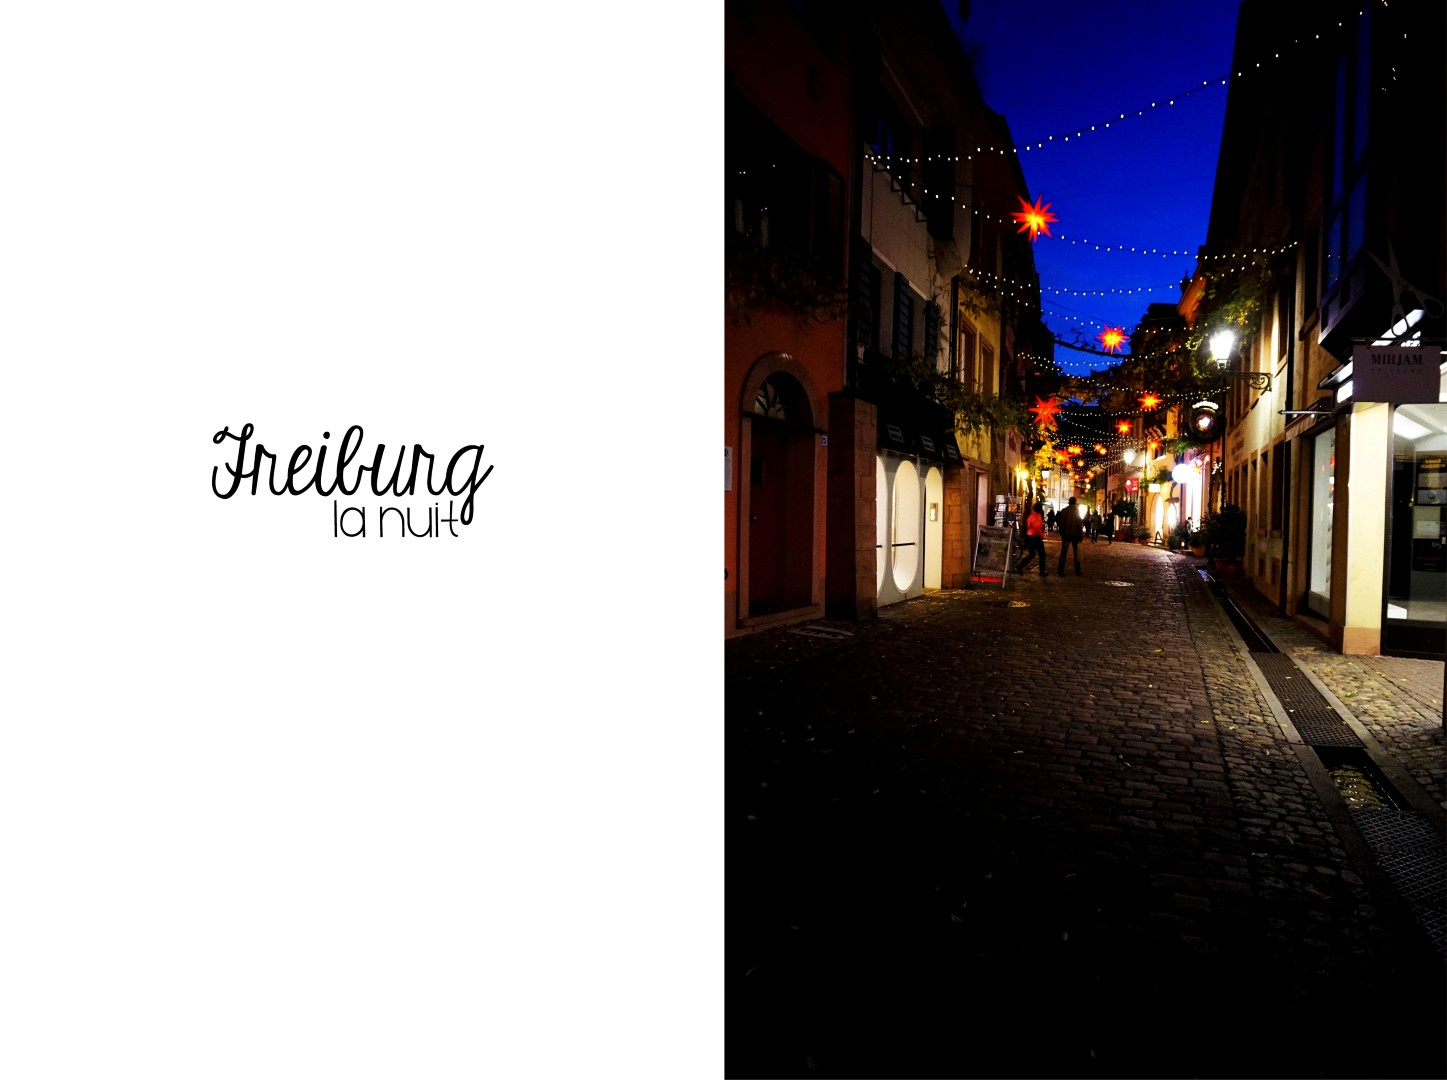 Freiburg - La nuit